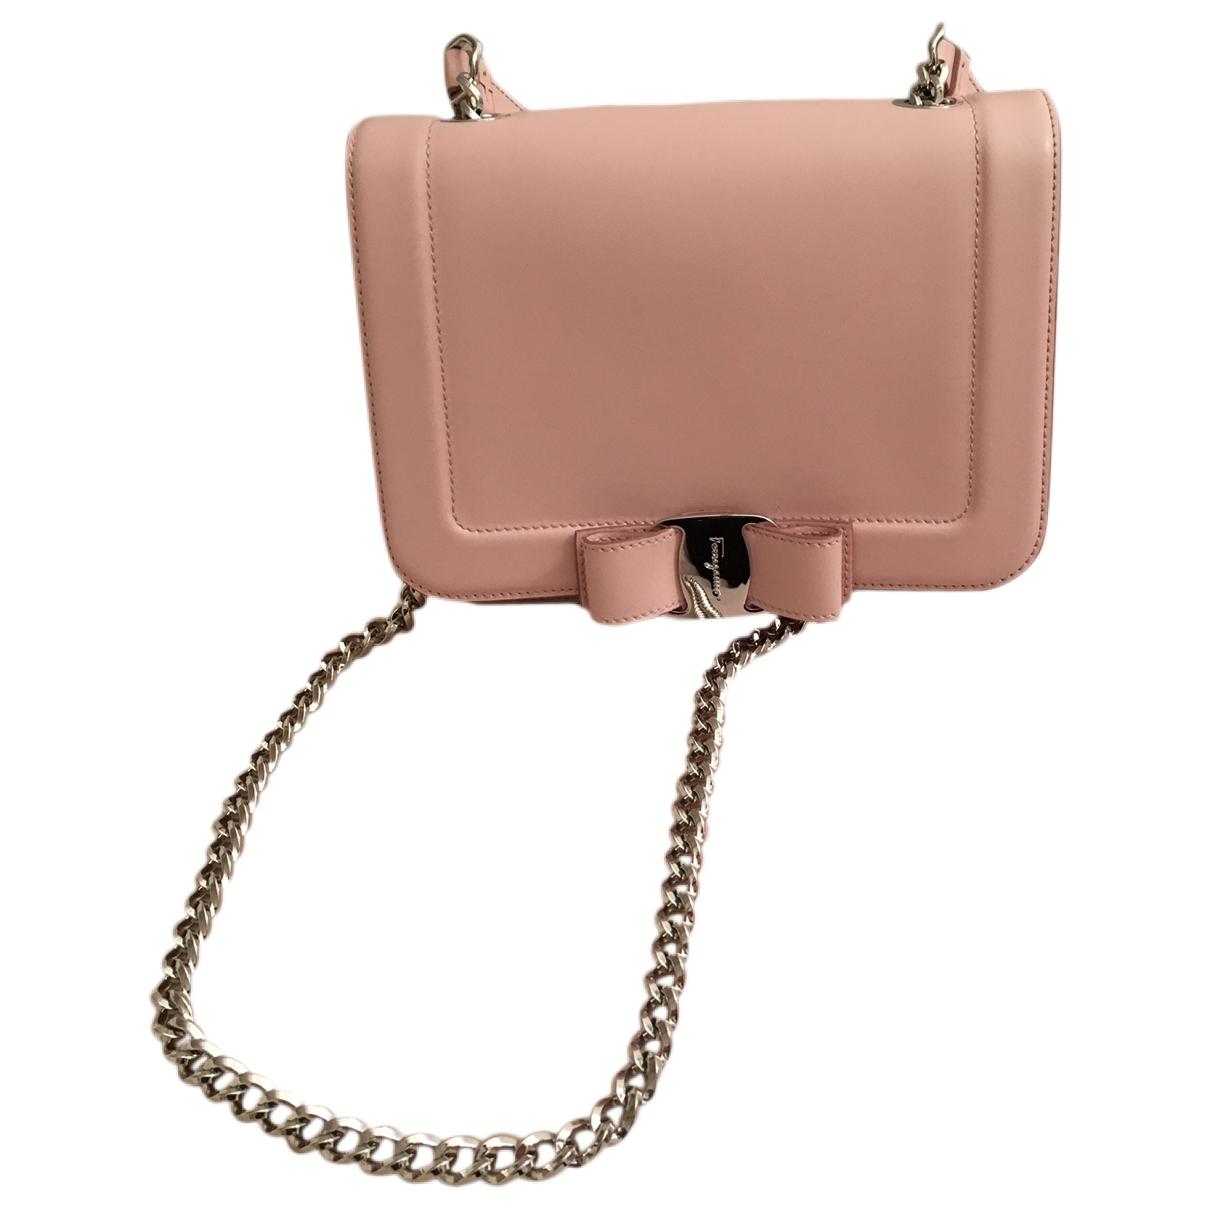 Salvatore Ferragamo \N Pink Leather handbag for Women \N